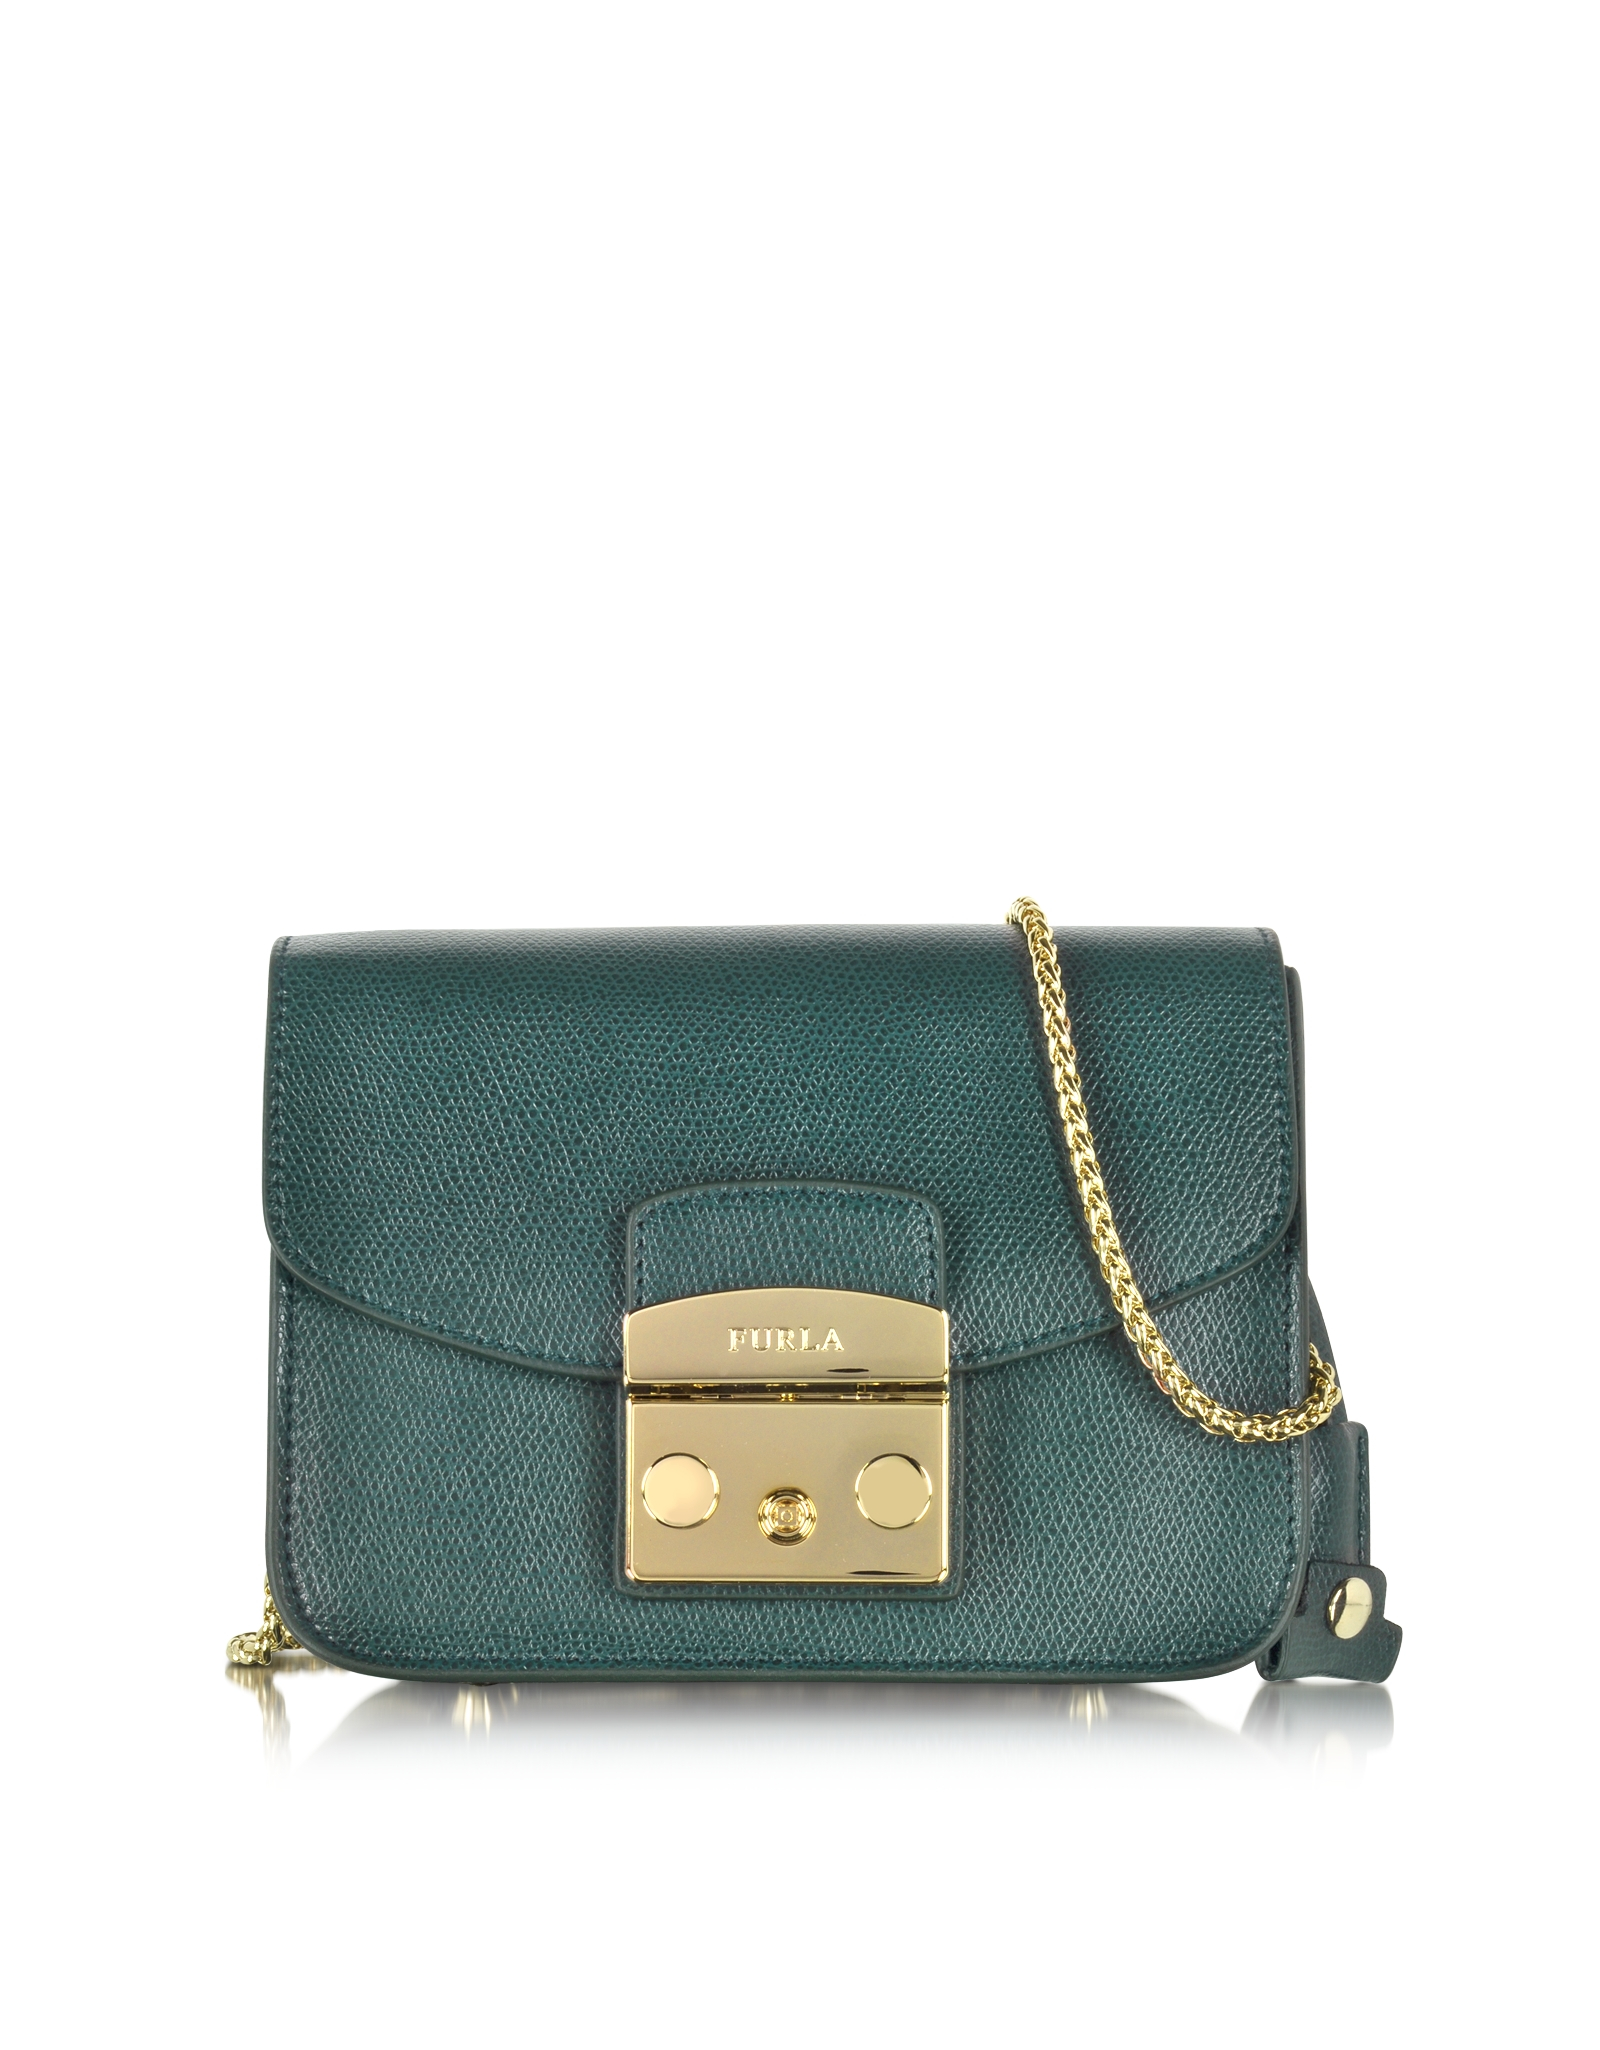 8249db19f88e Furla Metropolis Malachite Leather Shoulder Bag in Metallic - Lyst